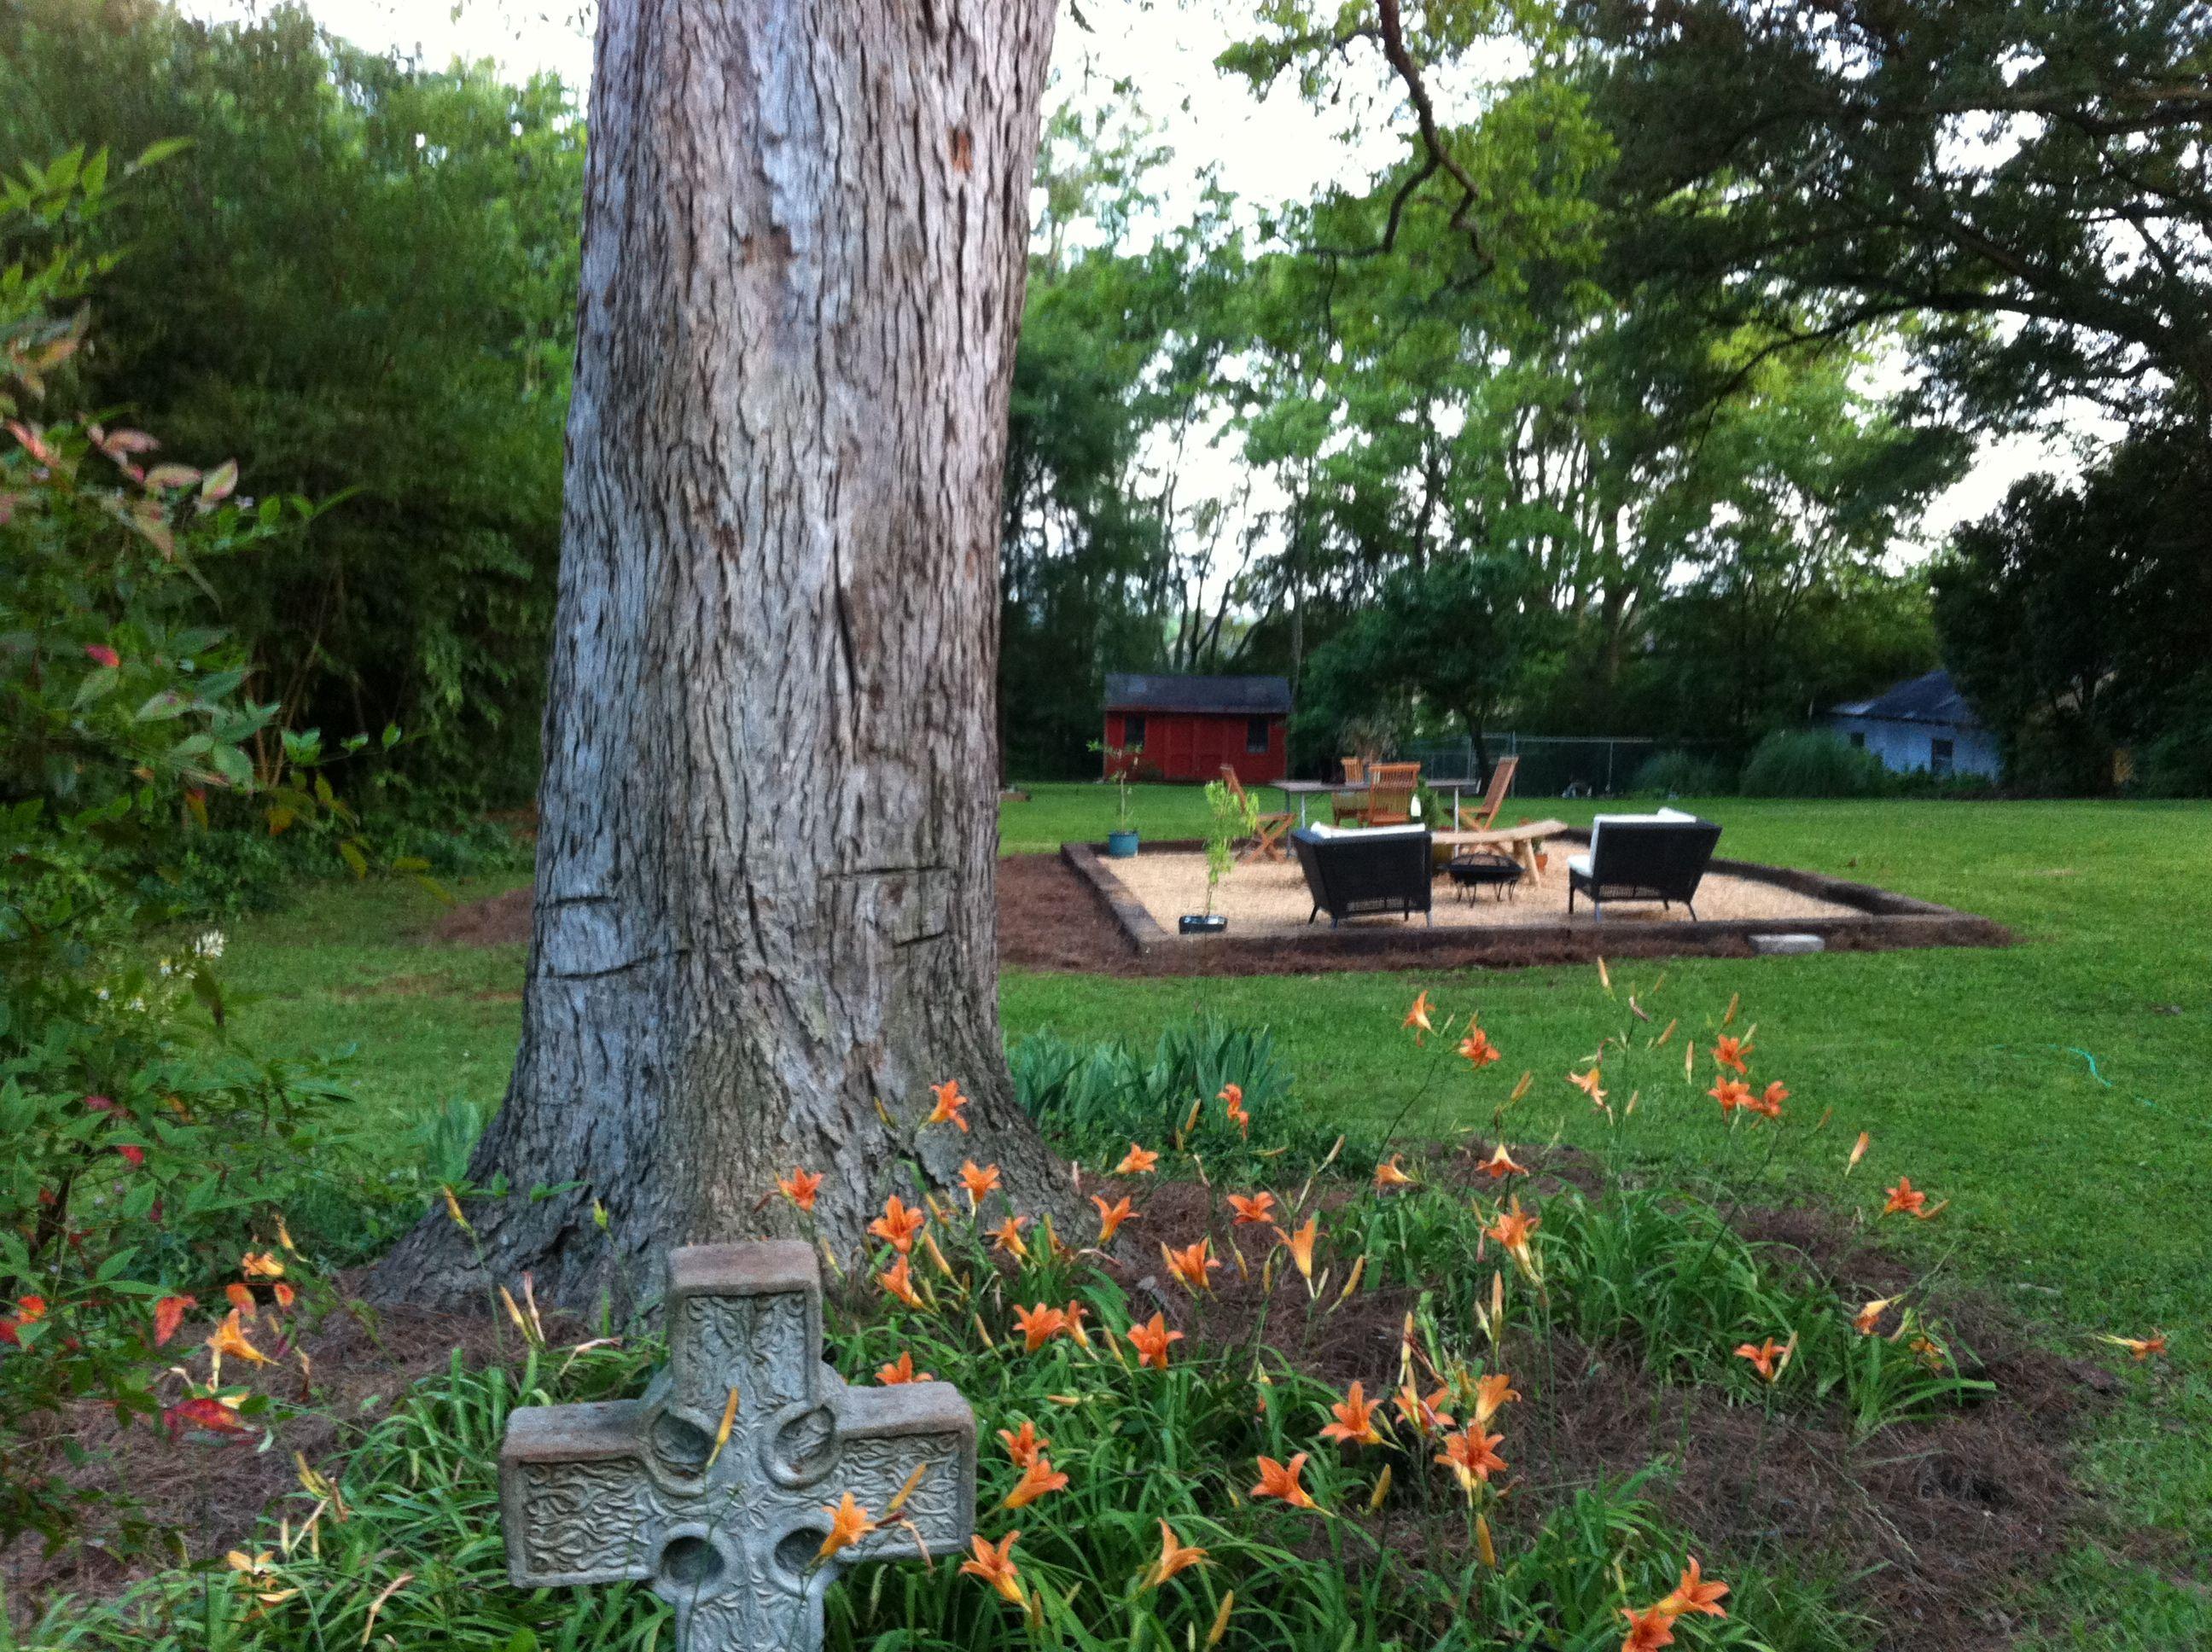 pea gravel patio | Backyard, Gravel patio, Pea gravel patio